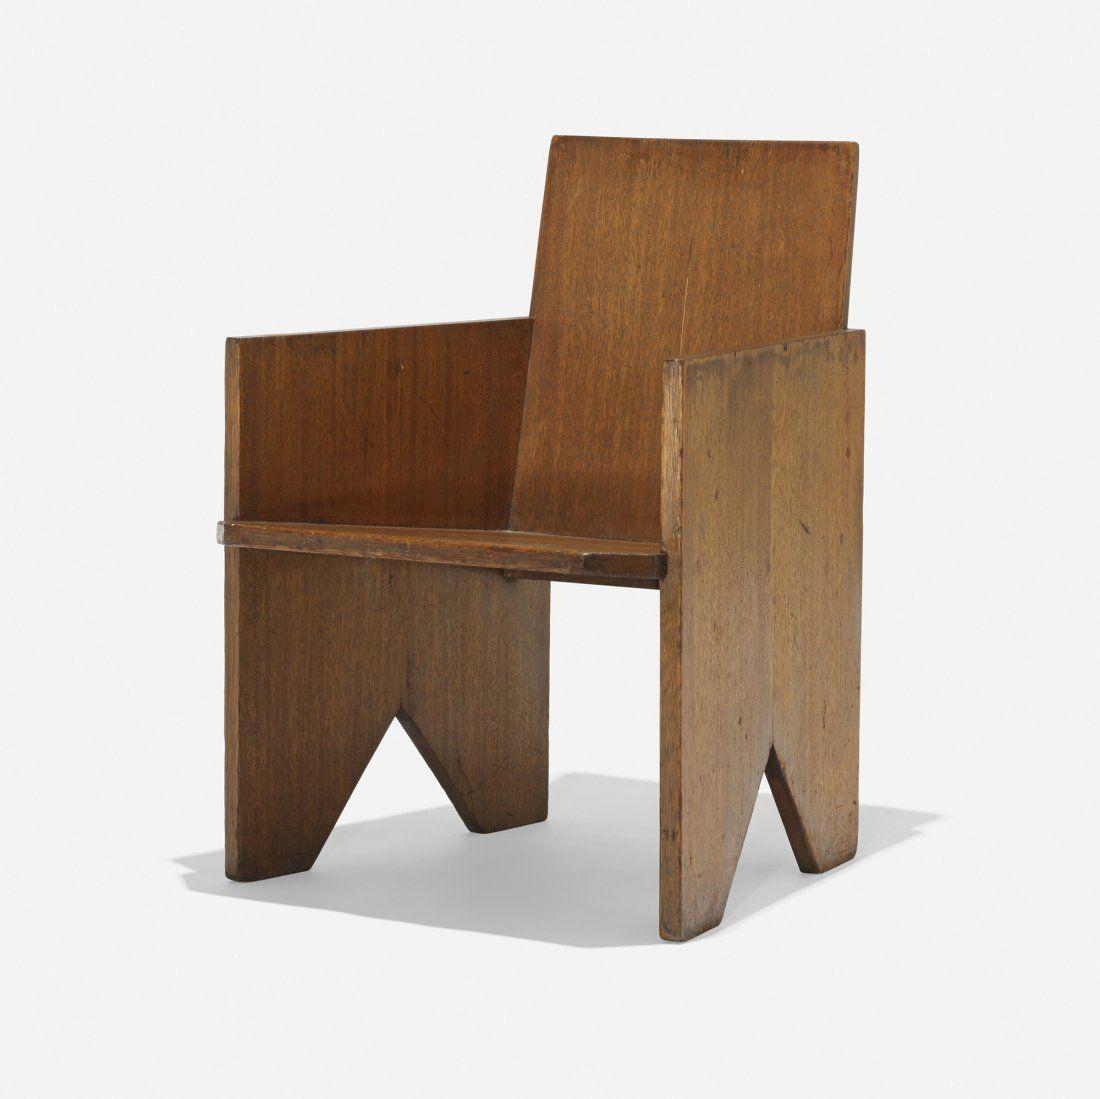 Interior Design Addict: // Ilonka Karasz; Mahogany